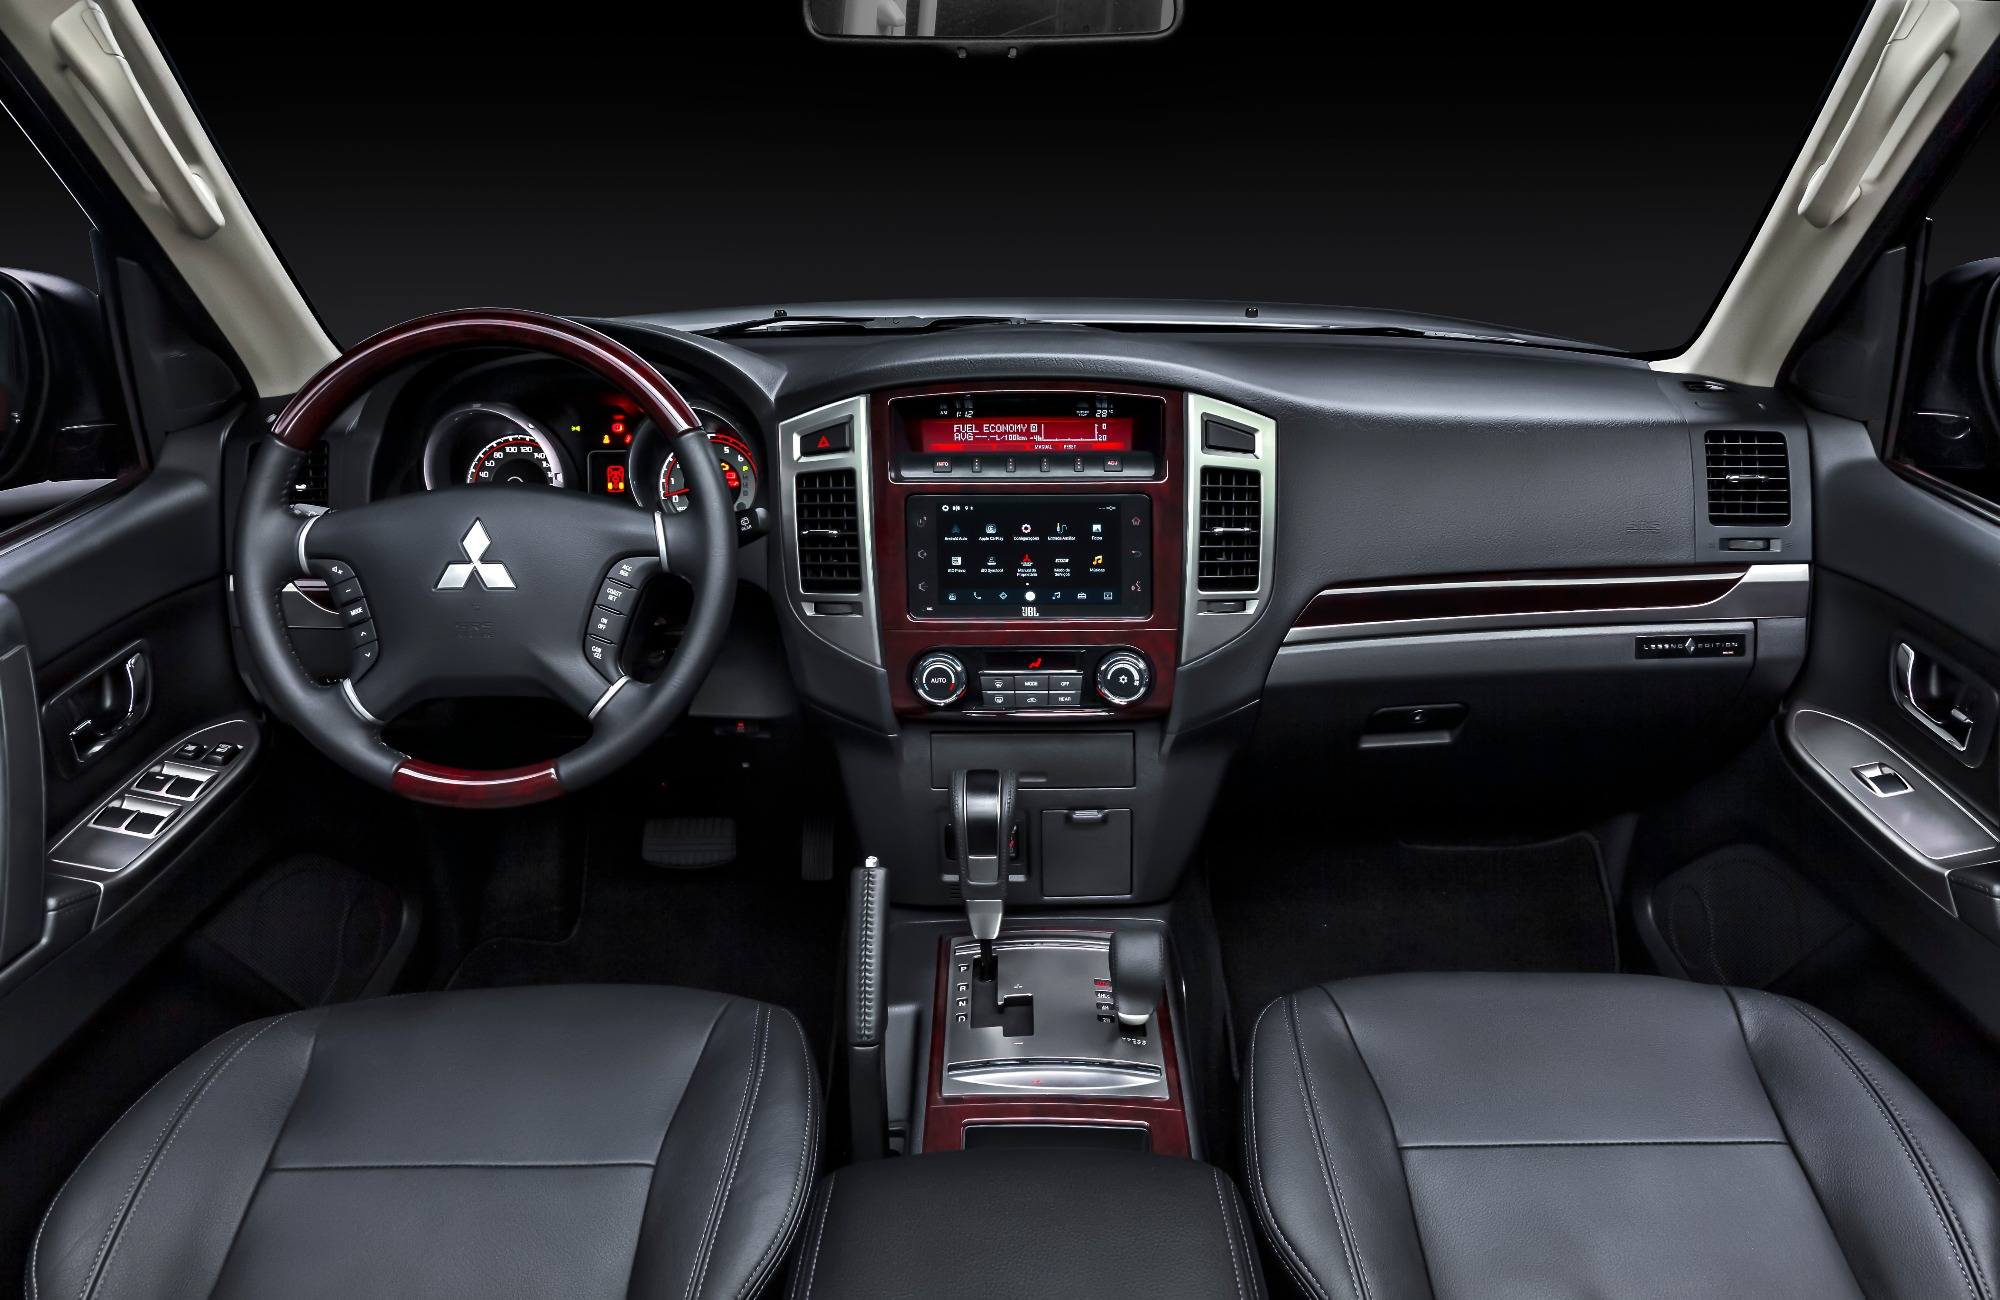 Pajero Full Legend Edition interior 1